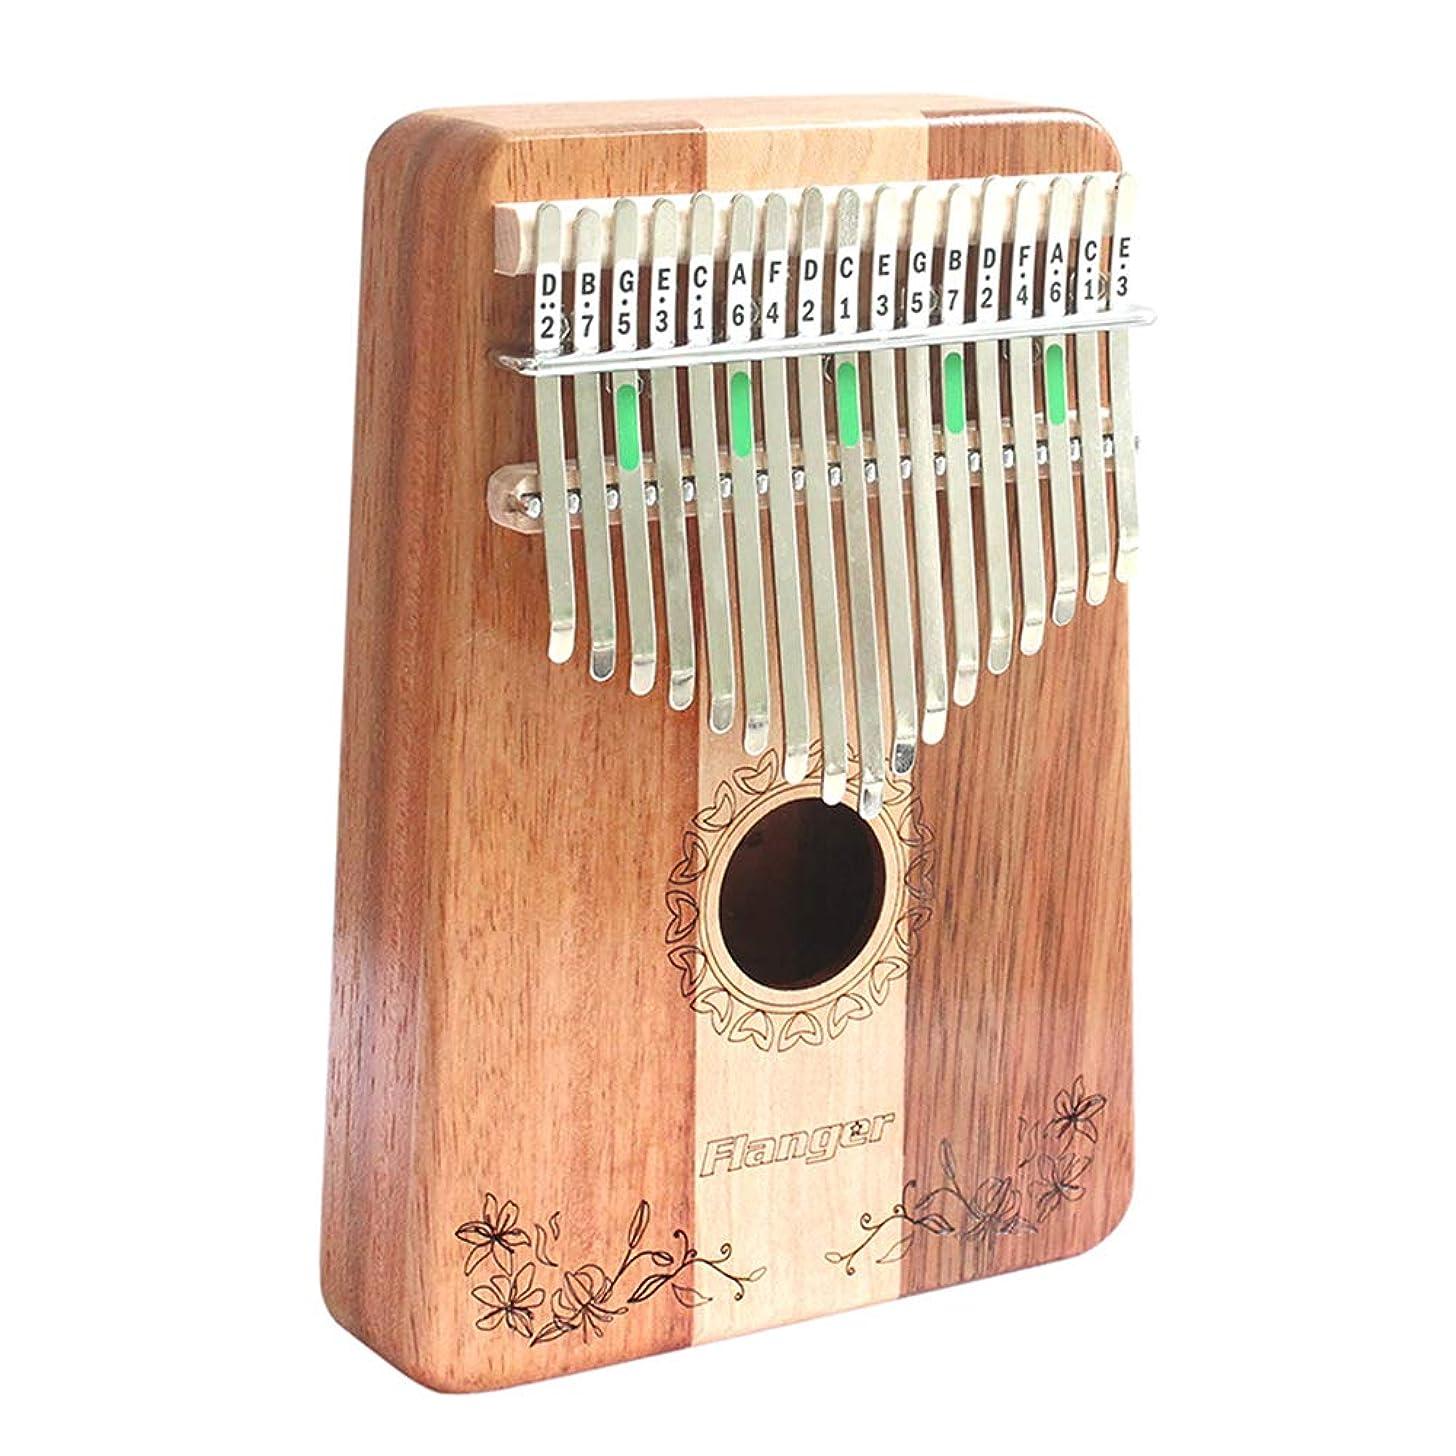 Flanger Kalimba 17 Keys Portable Thumb Piano with Instruction and Tune Hammer Solid Finger Piano Mahogany Body (FK-17)